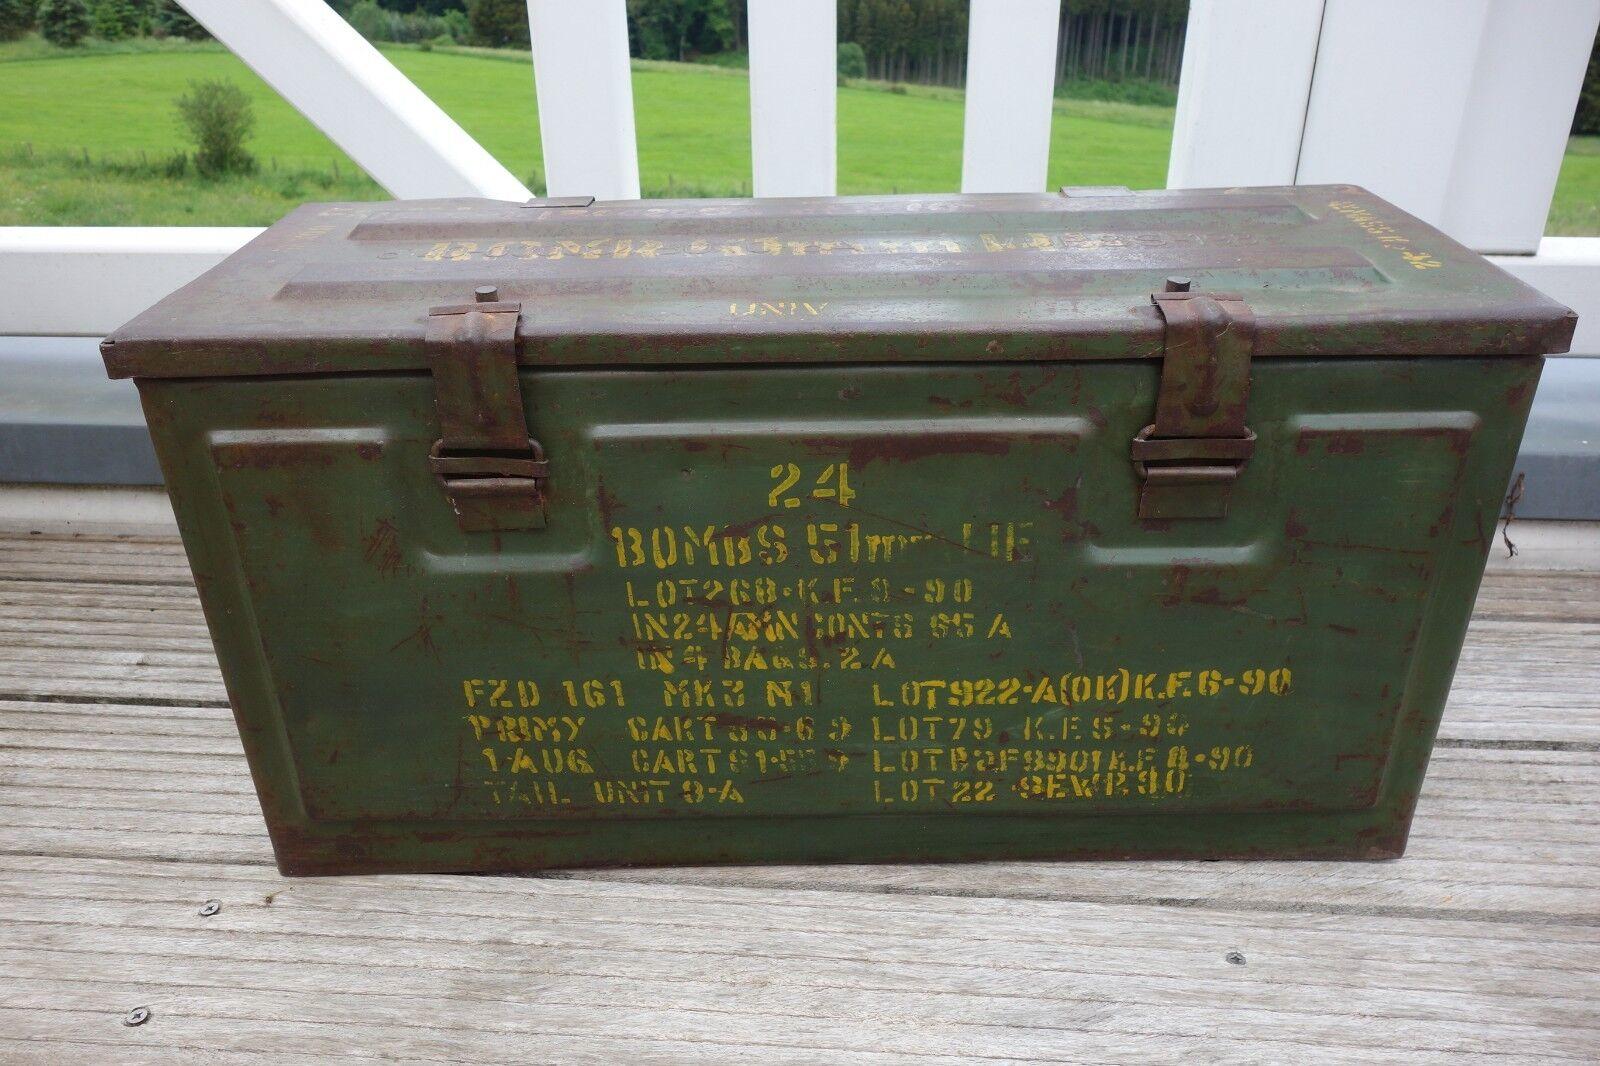 Nostalgie Munitionskiste Deko Kiste Eisen Truhe Retro Antik Look 31x62x24 cm NEU